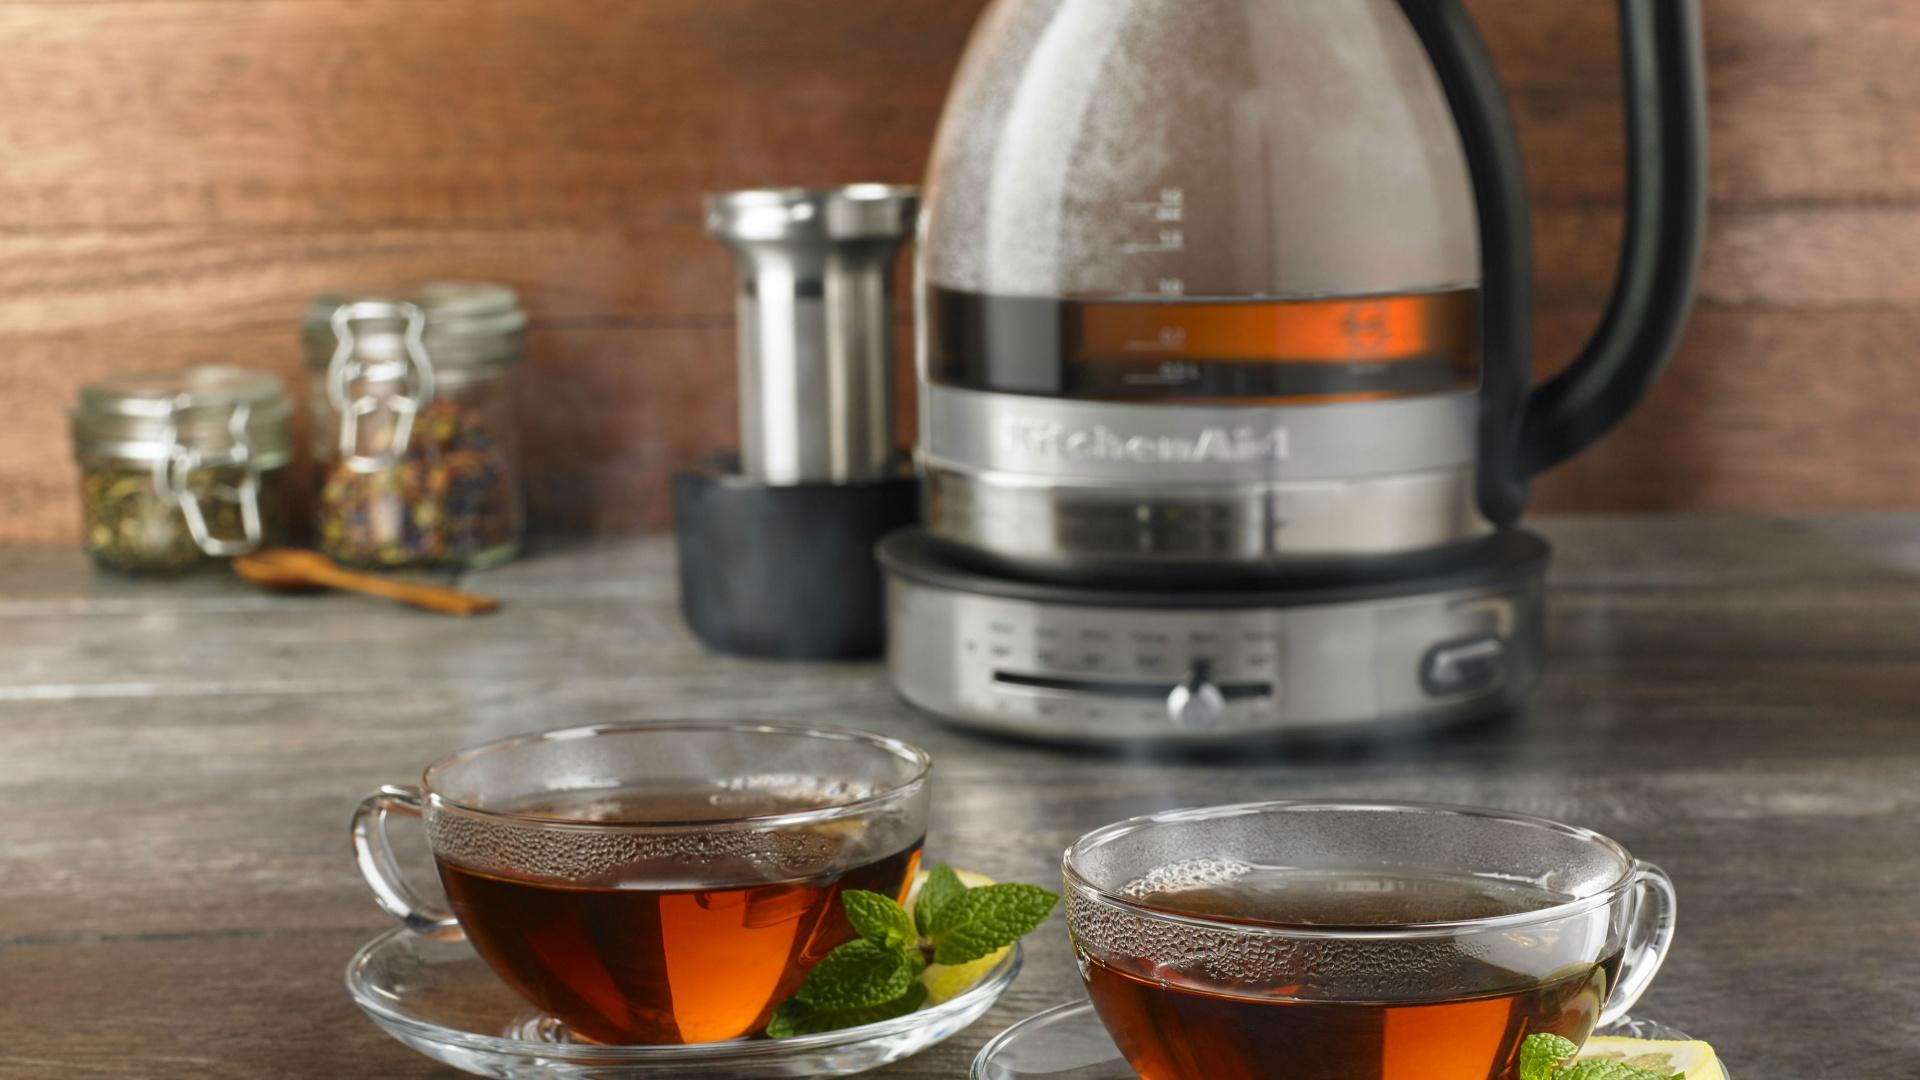 Weapons of Choice: KitchenAid Glass Tea Kettle